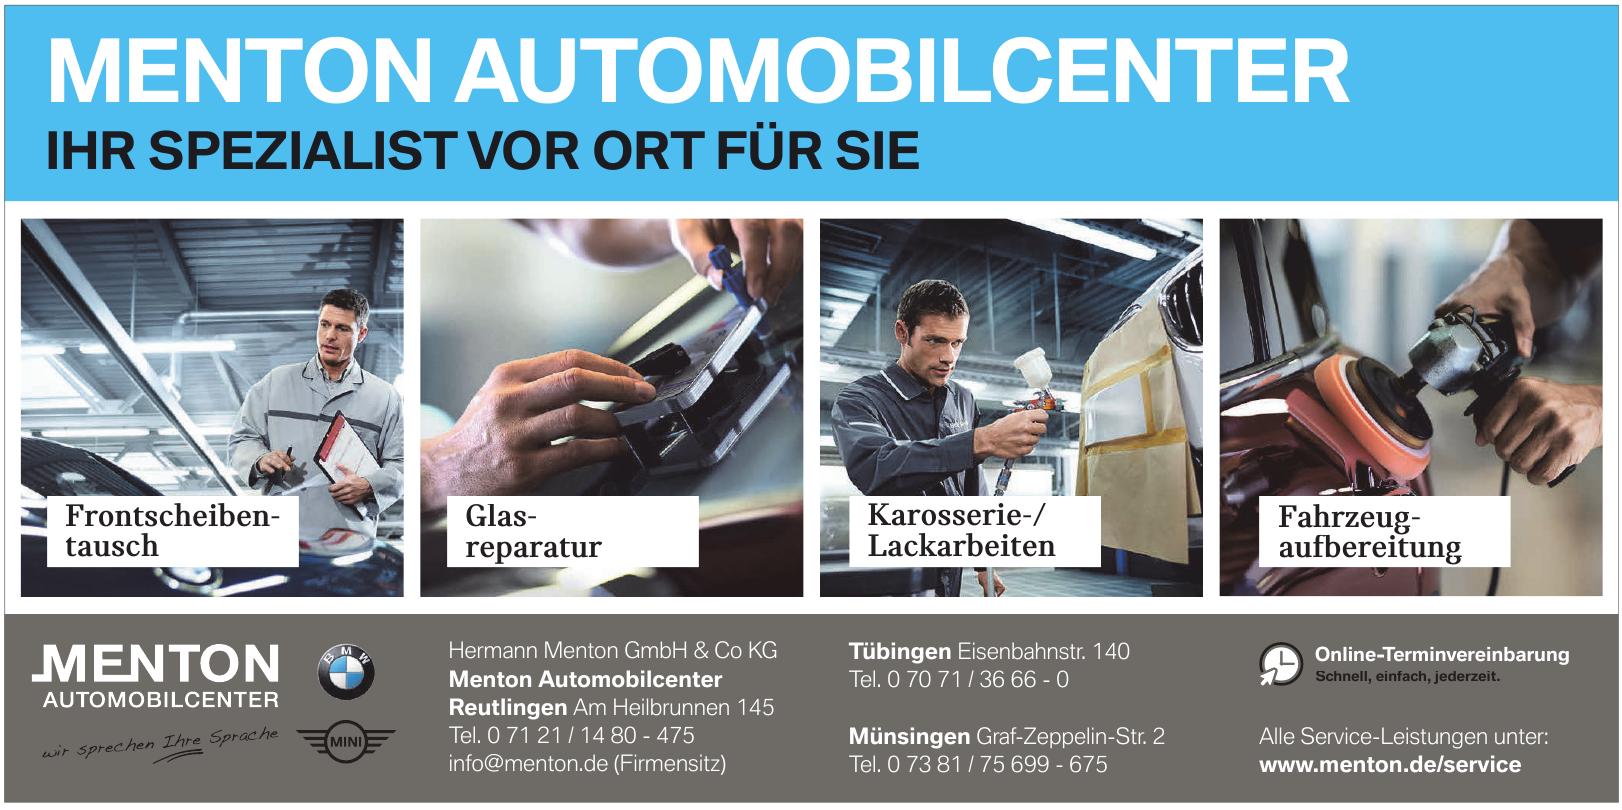 Hermann Menton GmbH & Co KG, Menton Automobilcenter